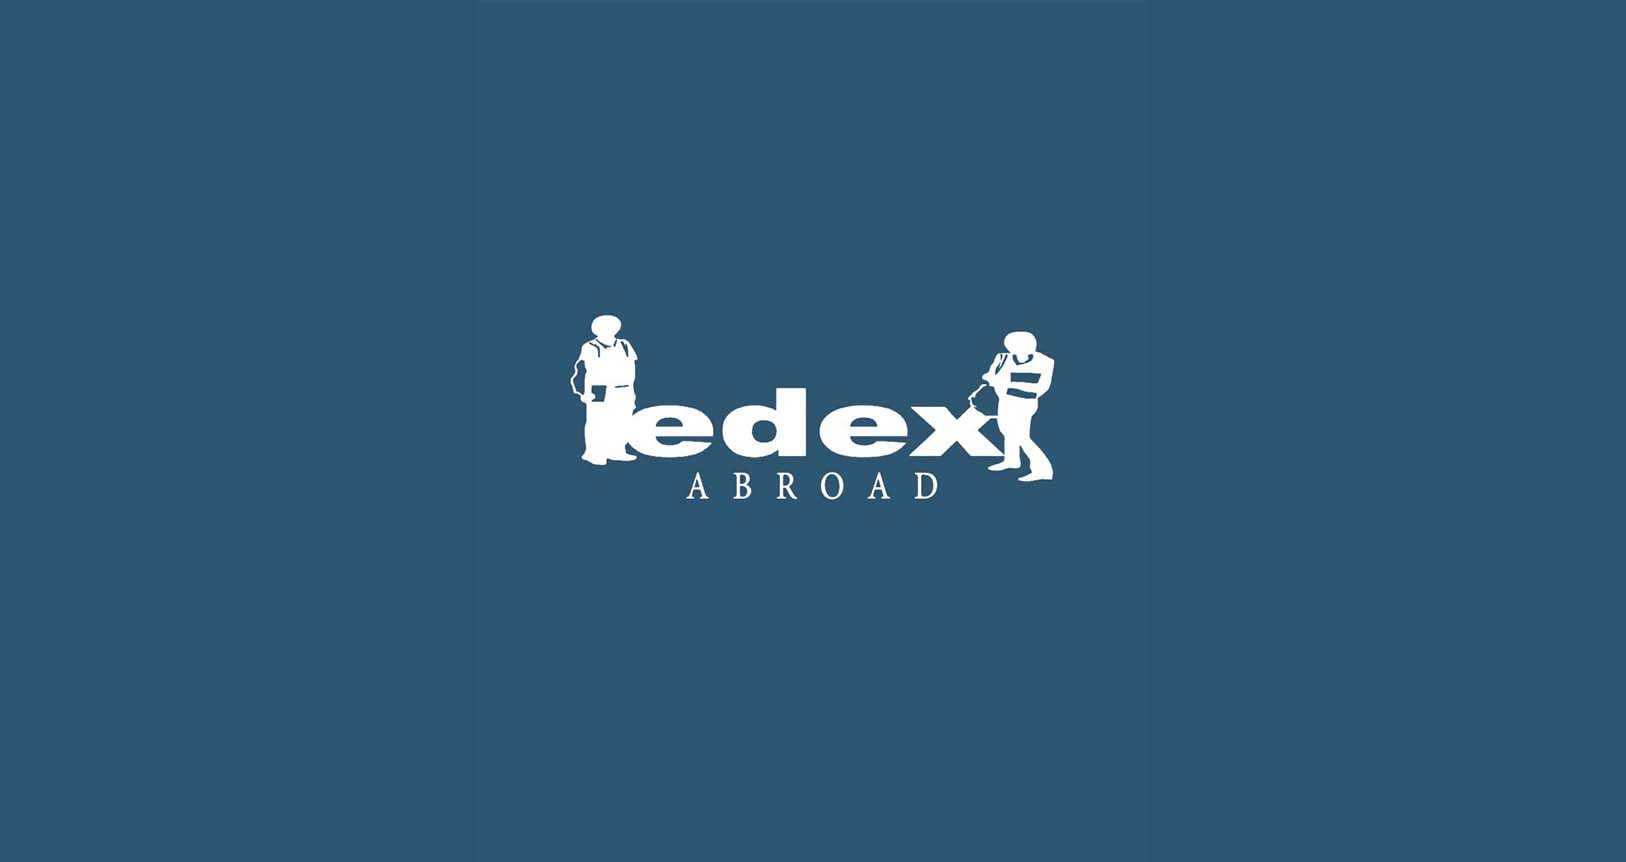 EDEX-ABROAD-TOP-WIDE-BANNER